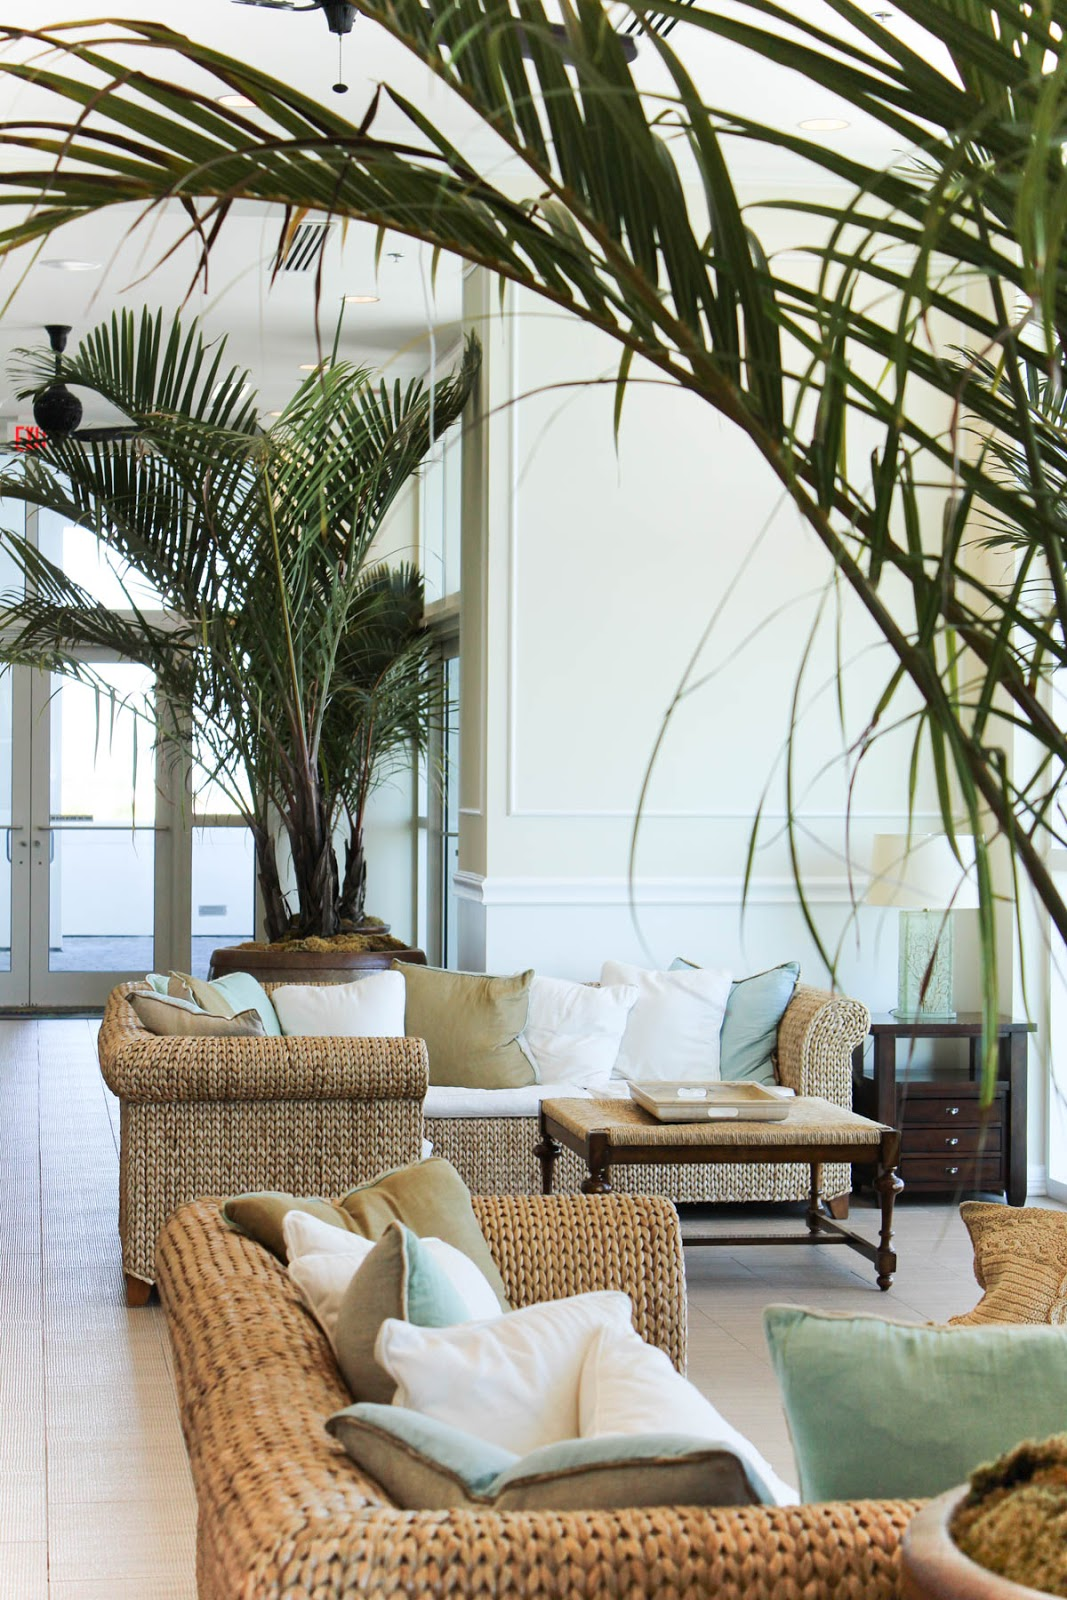 Margaritaville outdoor decor cozy home design for Margaritaville hotel decor